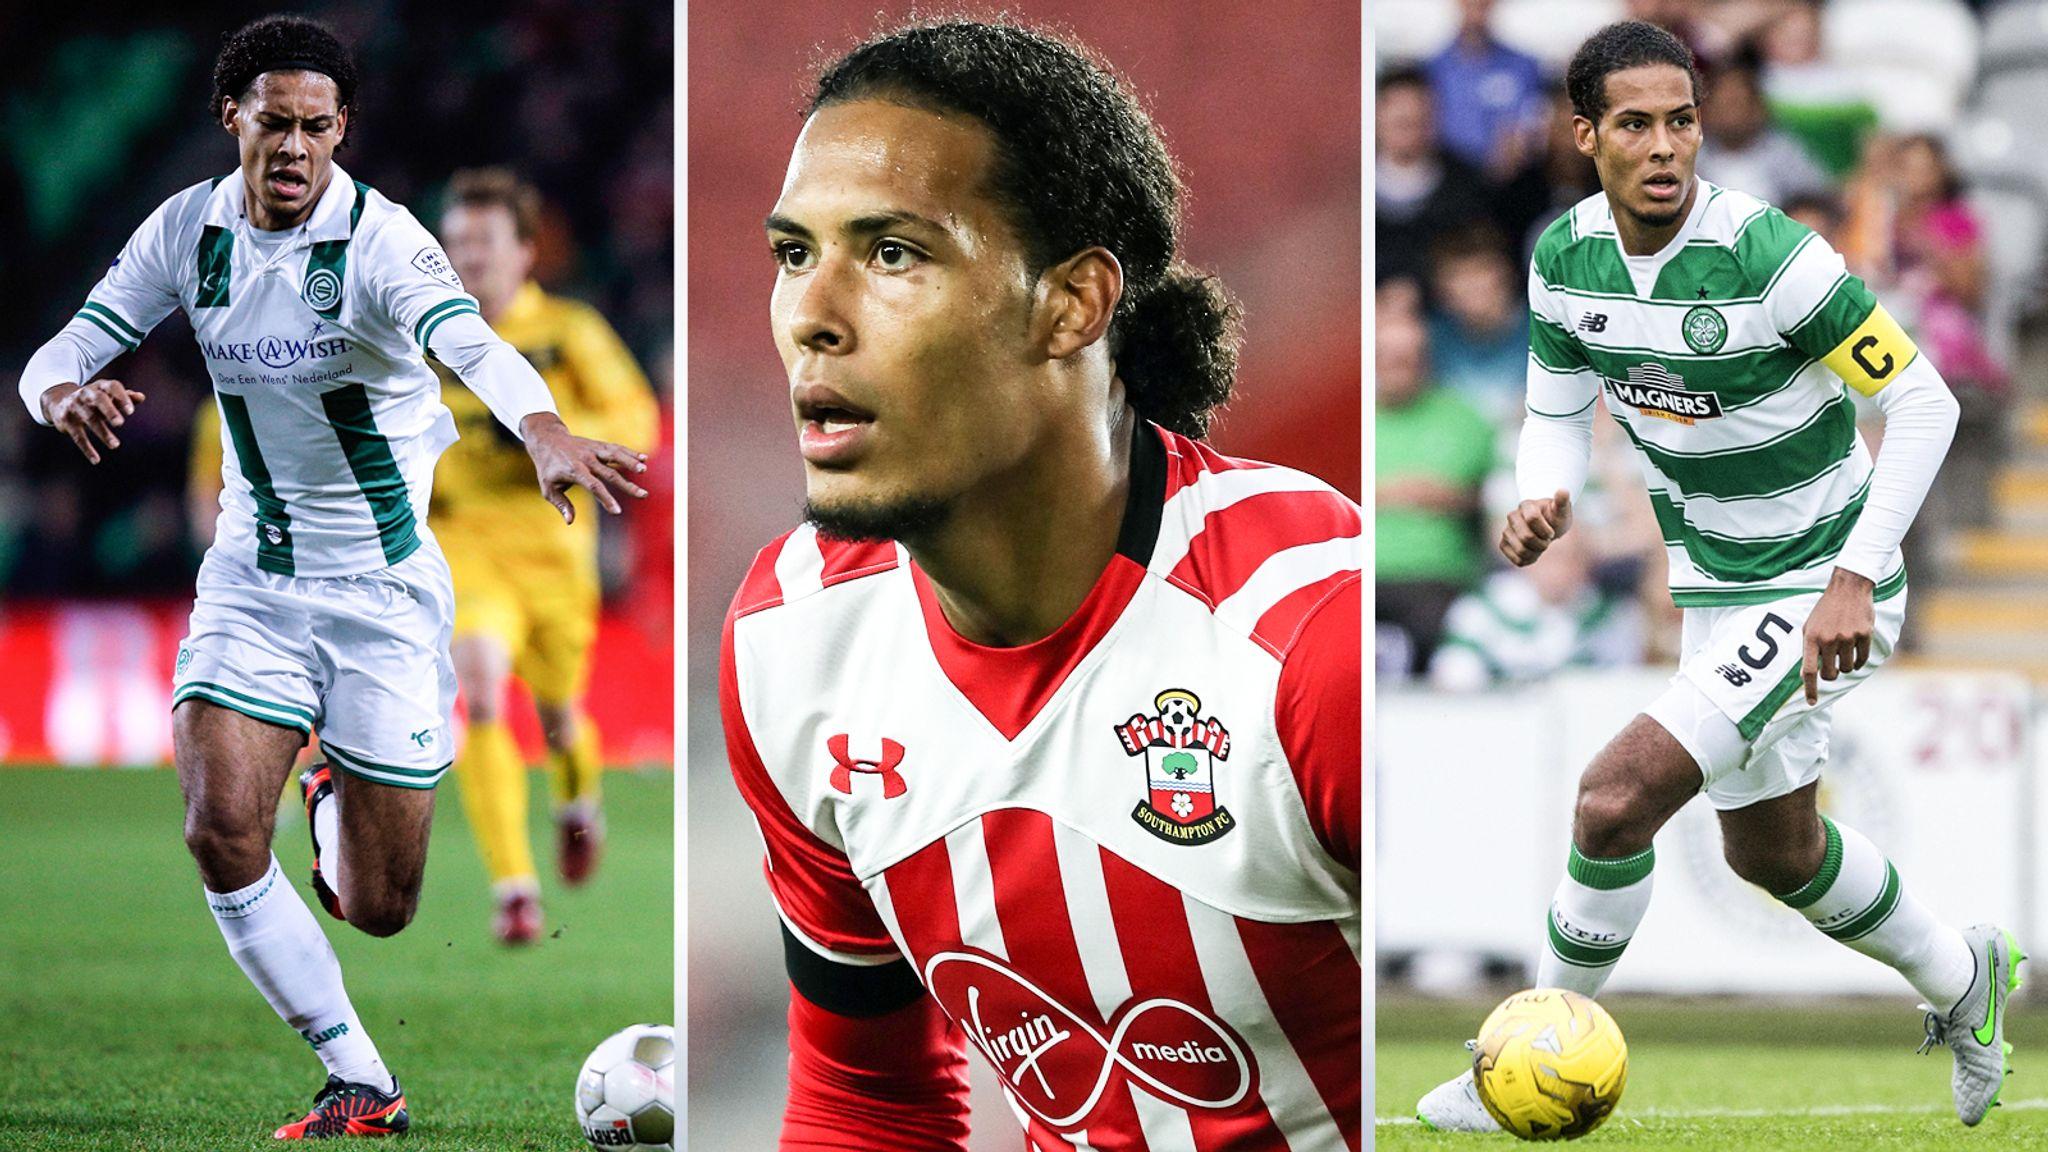 Virgil Van Dijk S Journey From Fc Groningen To Premier League Star Football News Sky Sports